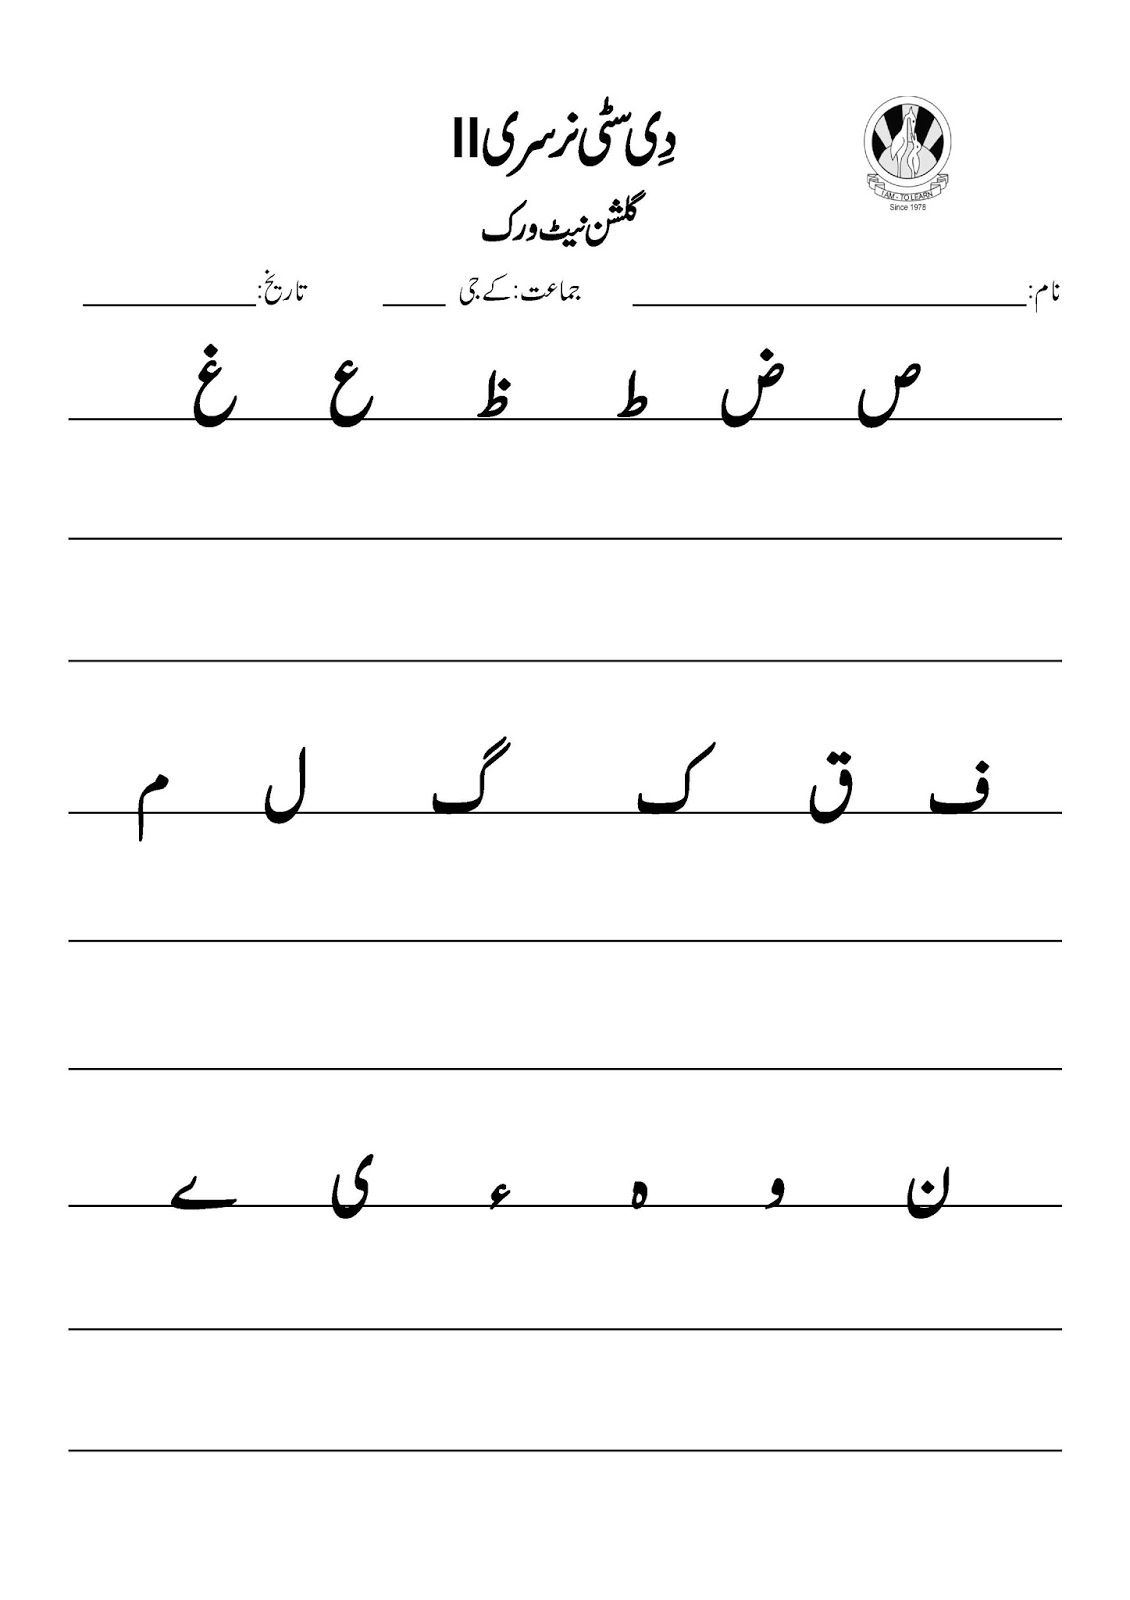 Download urdu worksheets for preschoolers